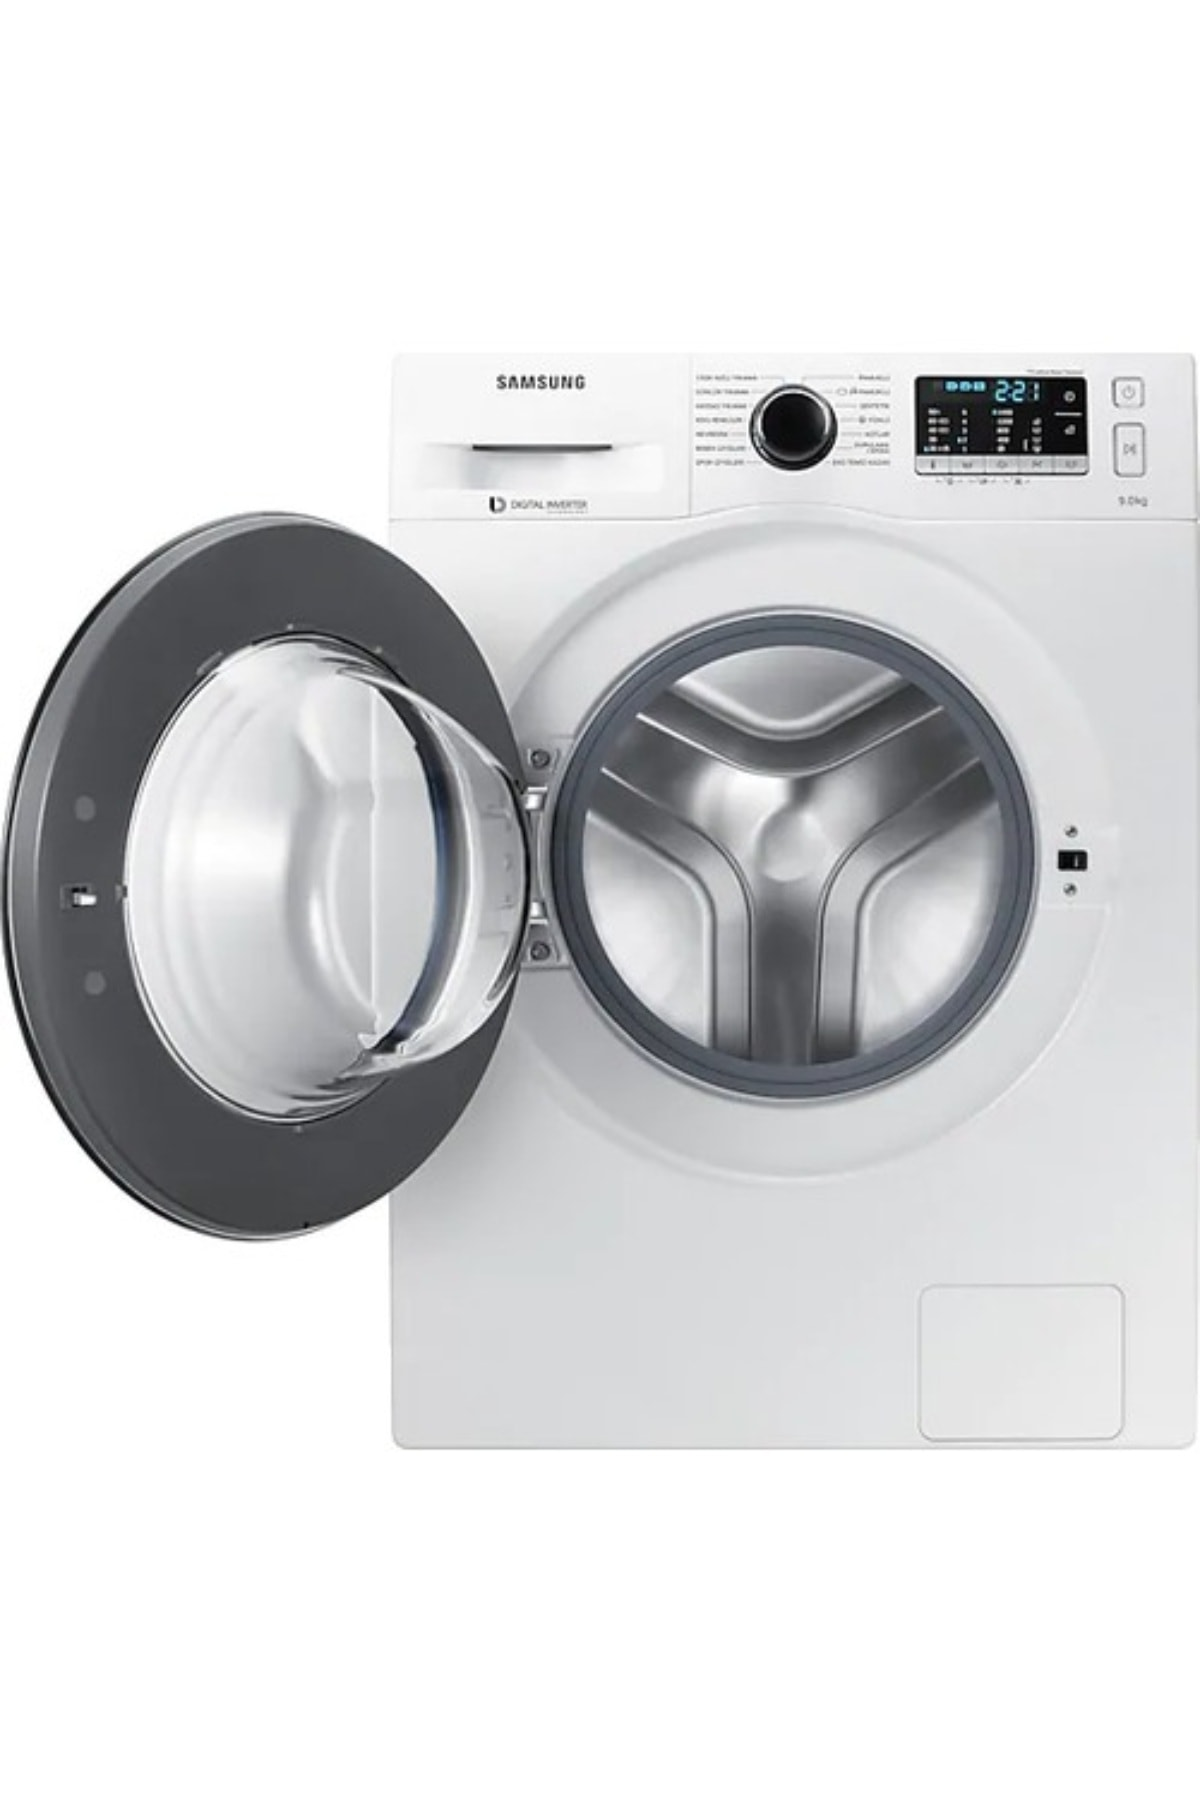 Samsung WW90J5475FW A+++ 1400 Devir 9 kg Çamaşır Makinesi 2